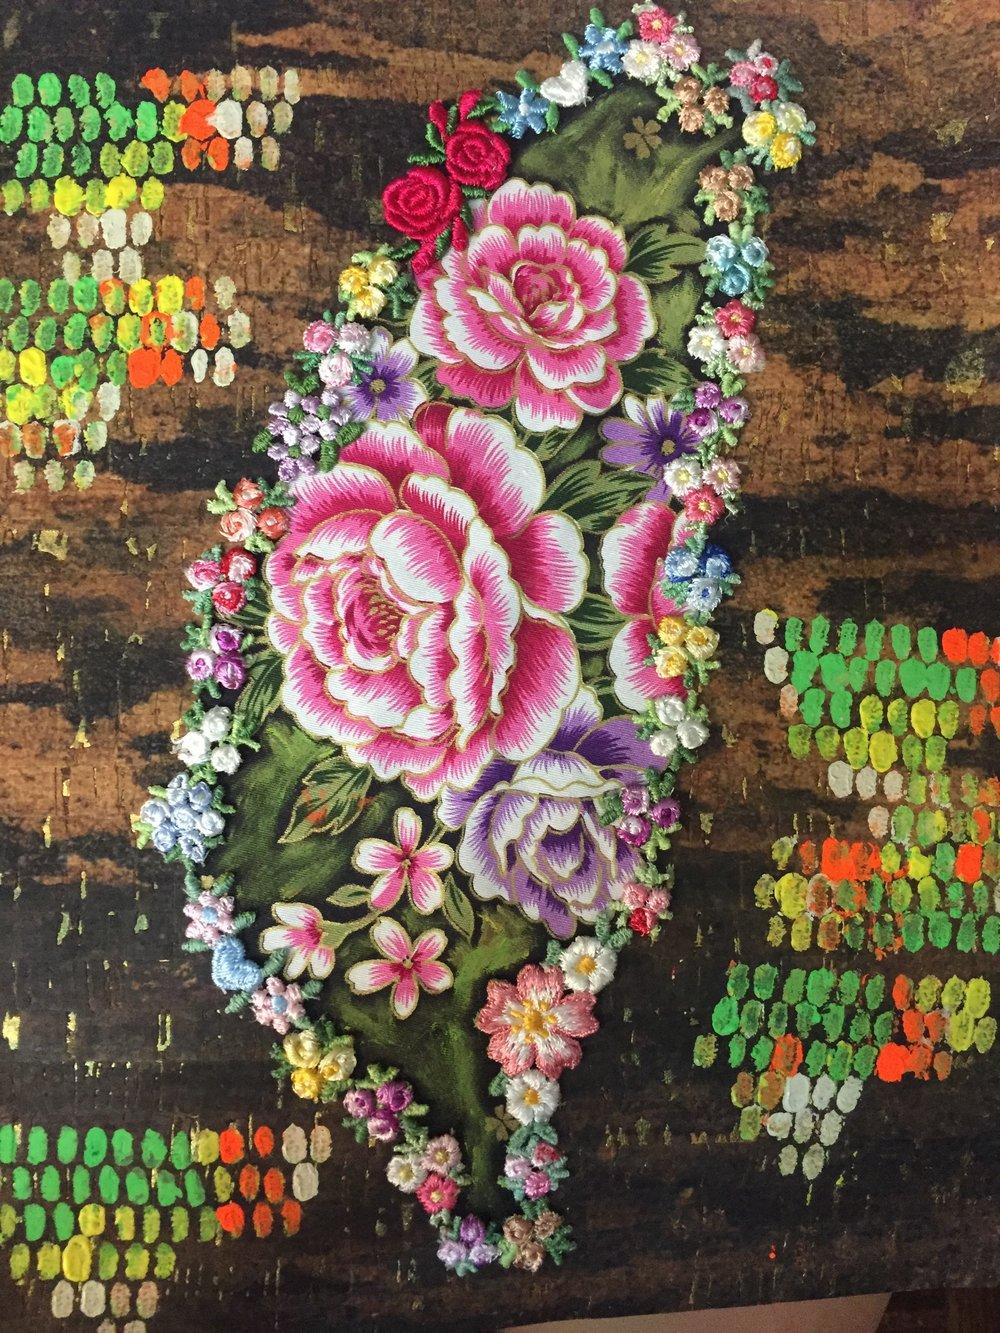 Taiwan Textile Art 2 - 201813